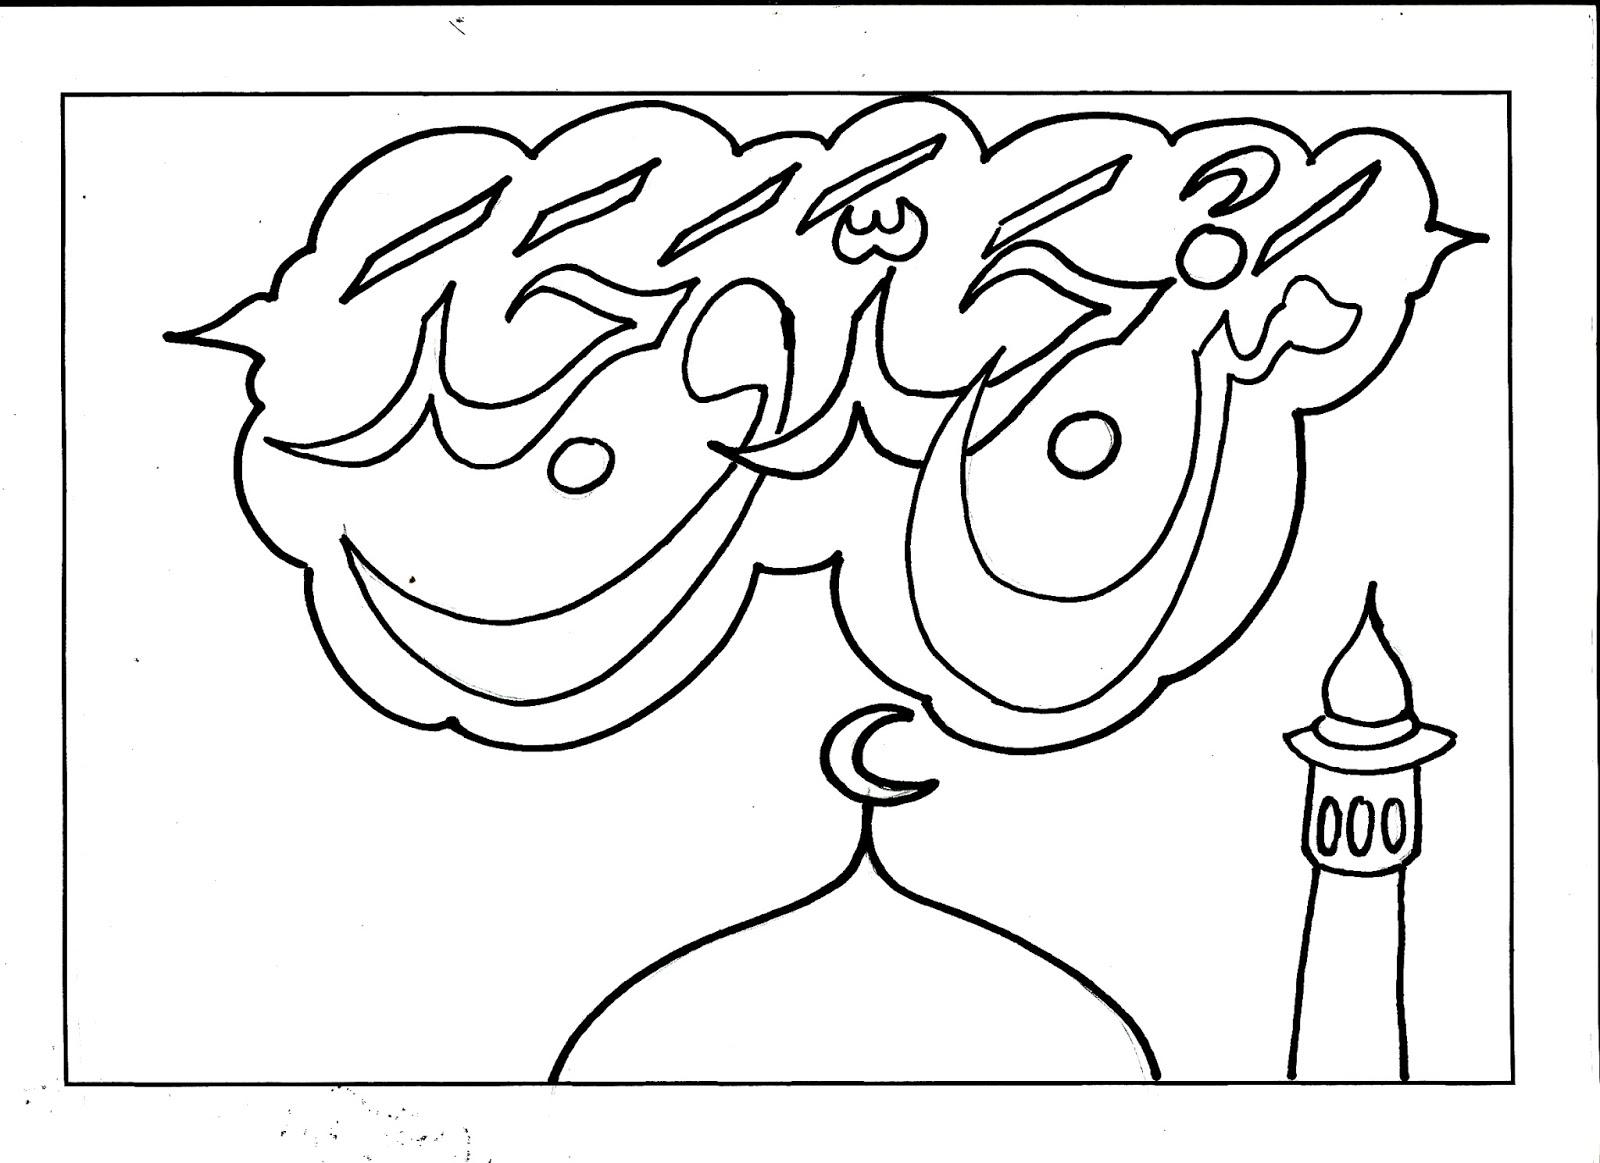 Izarnazar Gambar Mewarnai Kaligrafi Hitam Putih